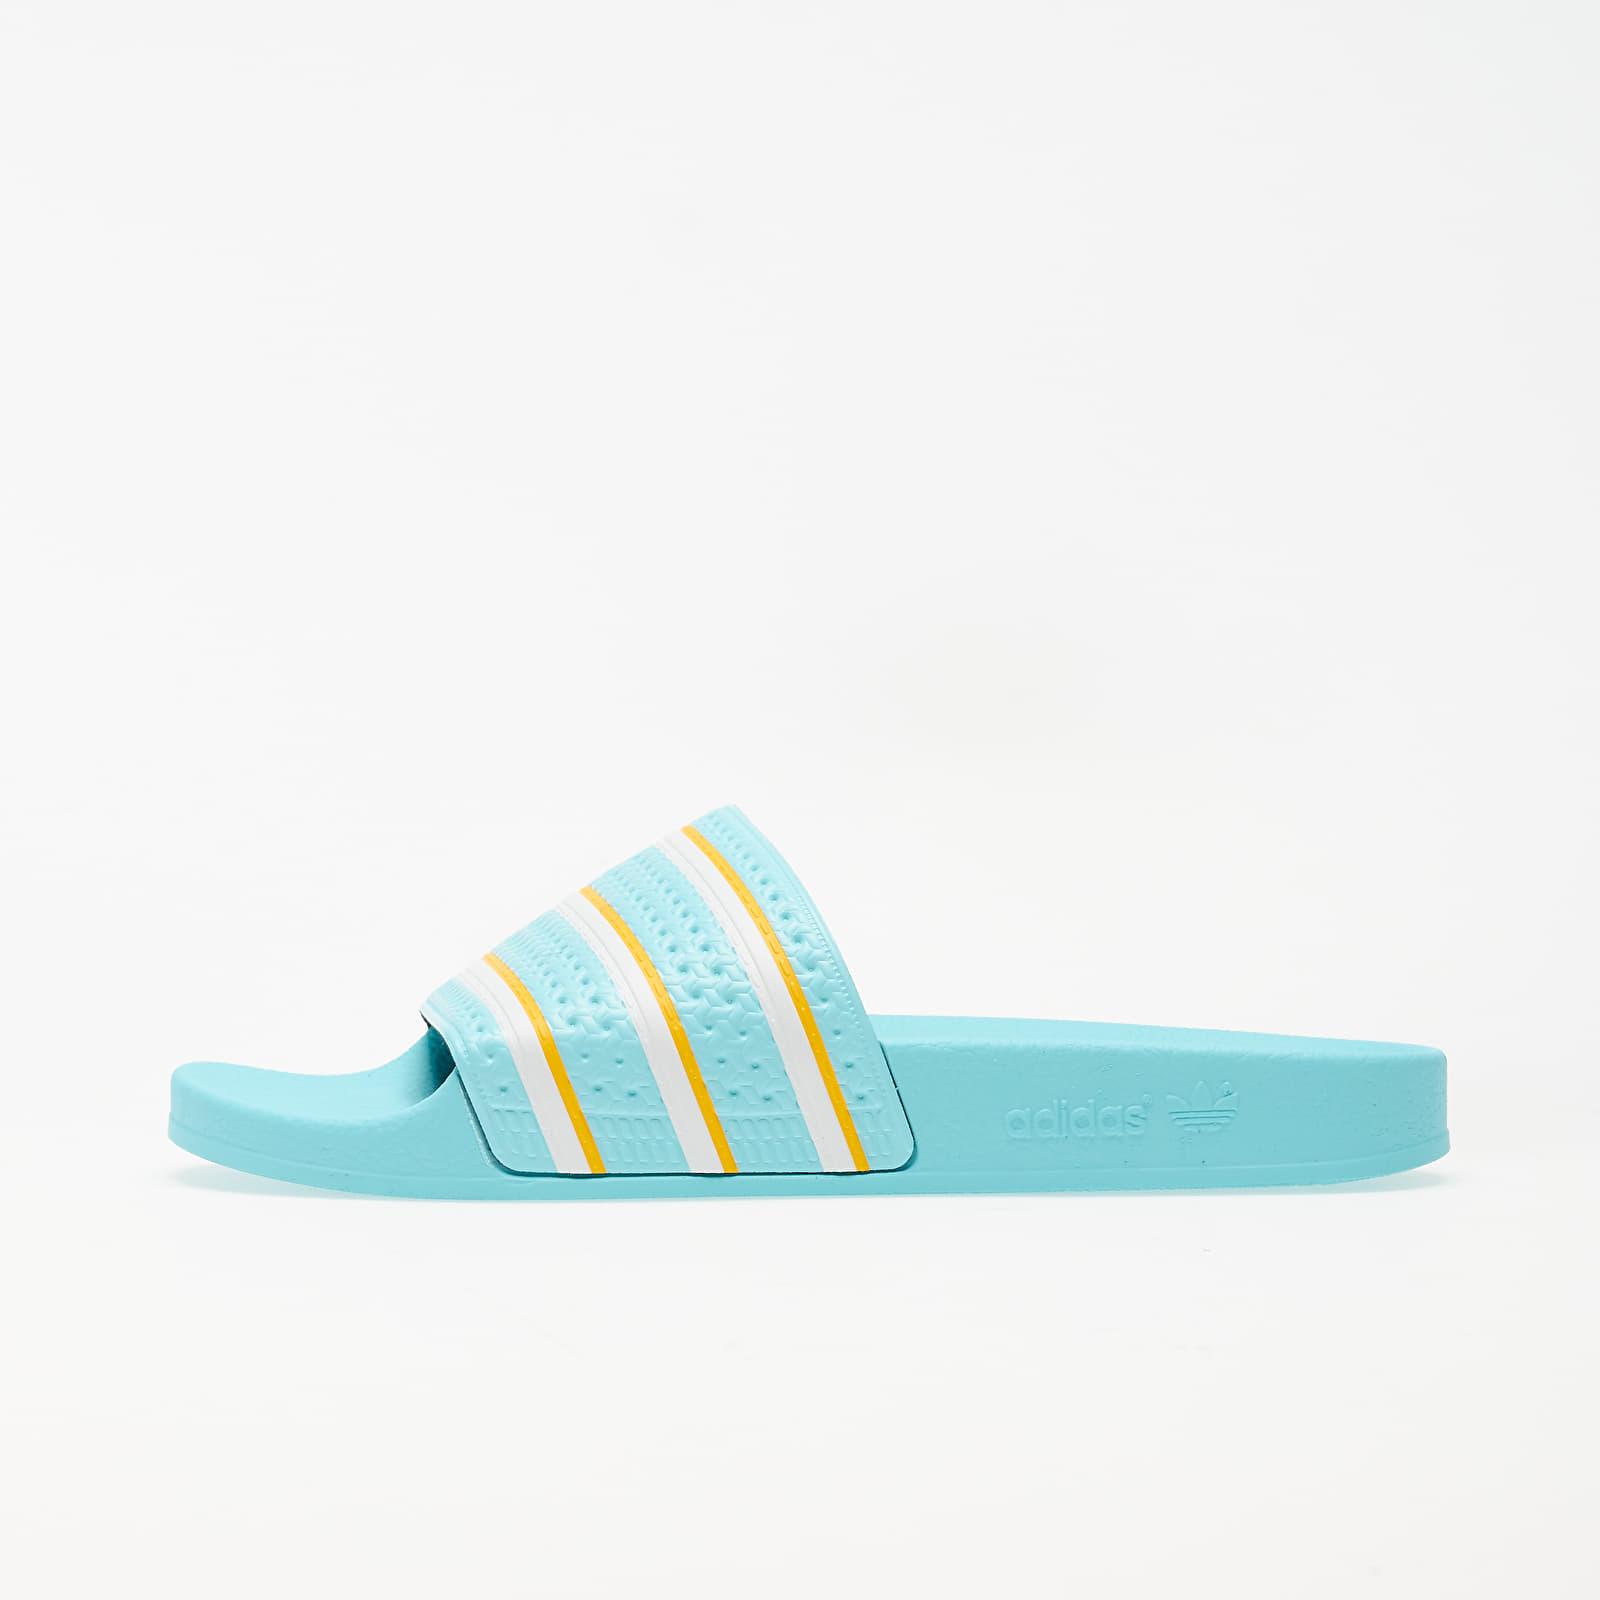 Pánské tenisky a boty adidas Adilette Blue Zest/ Ftwr White/ Wonder Glow